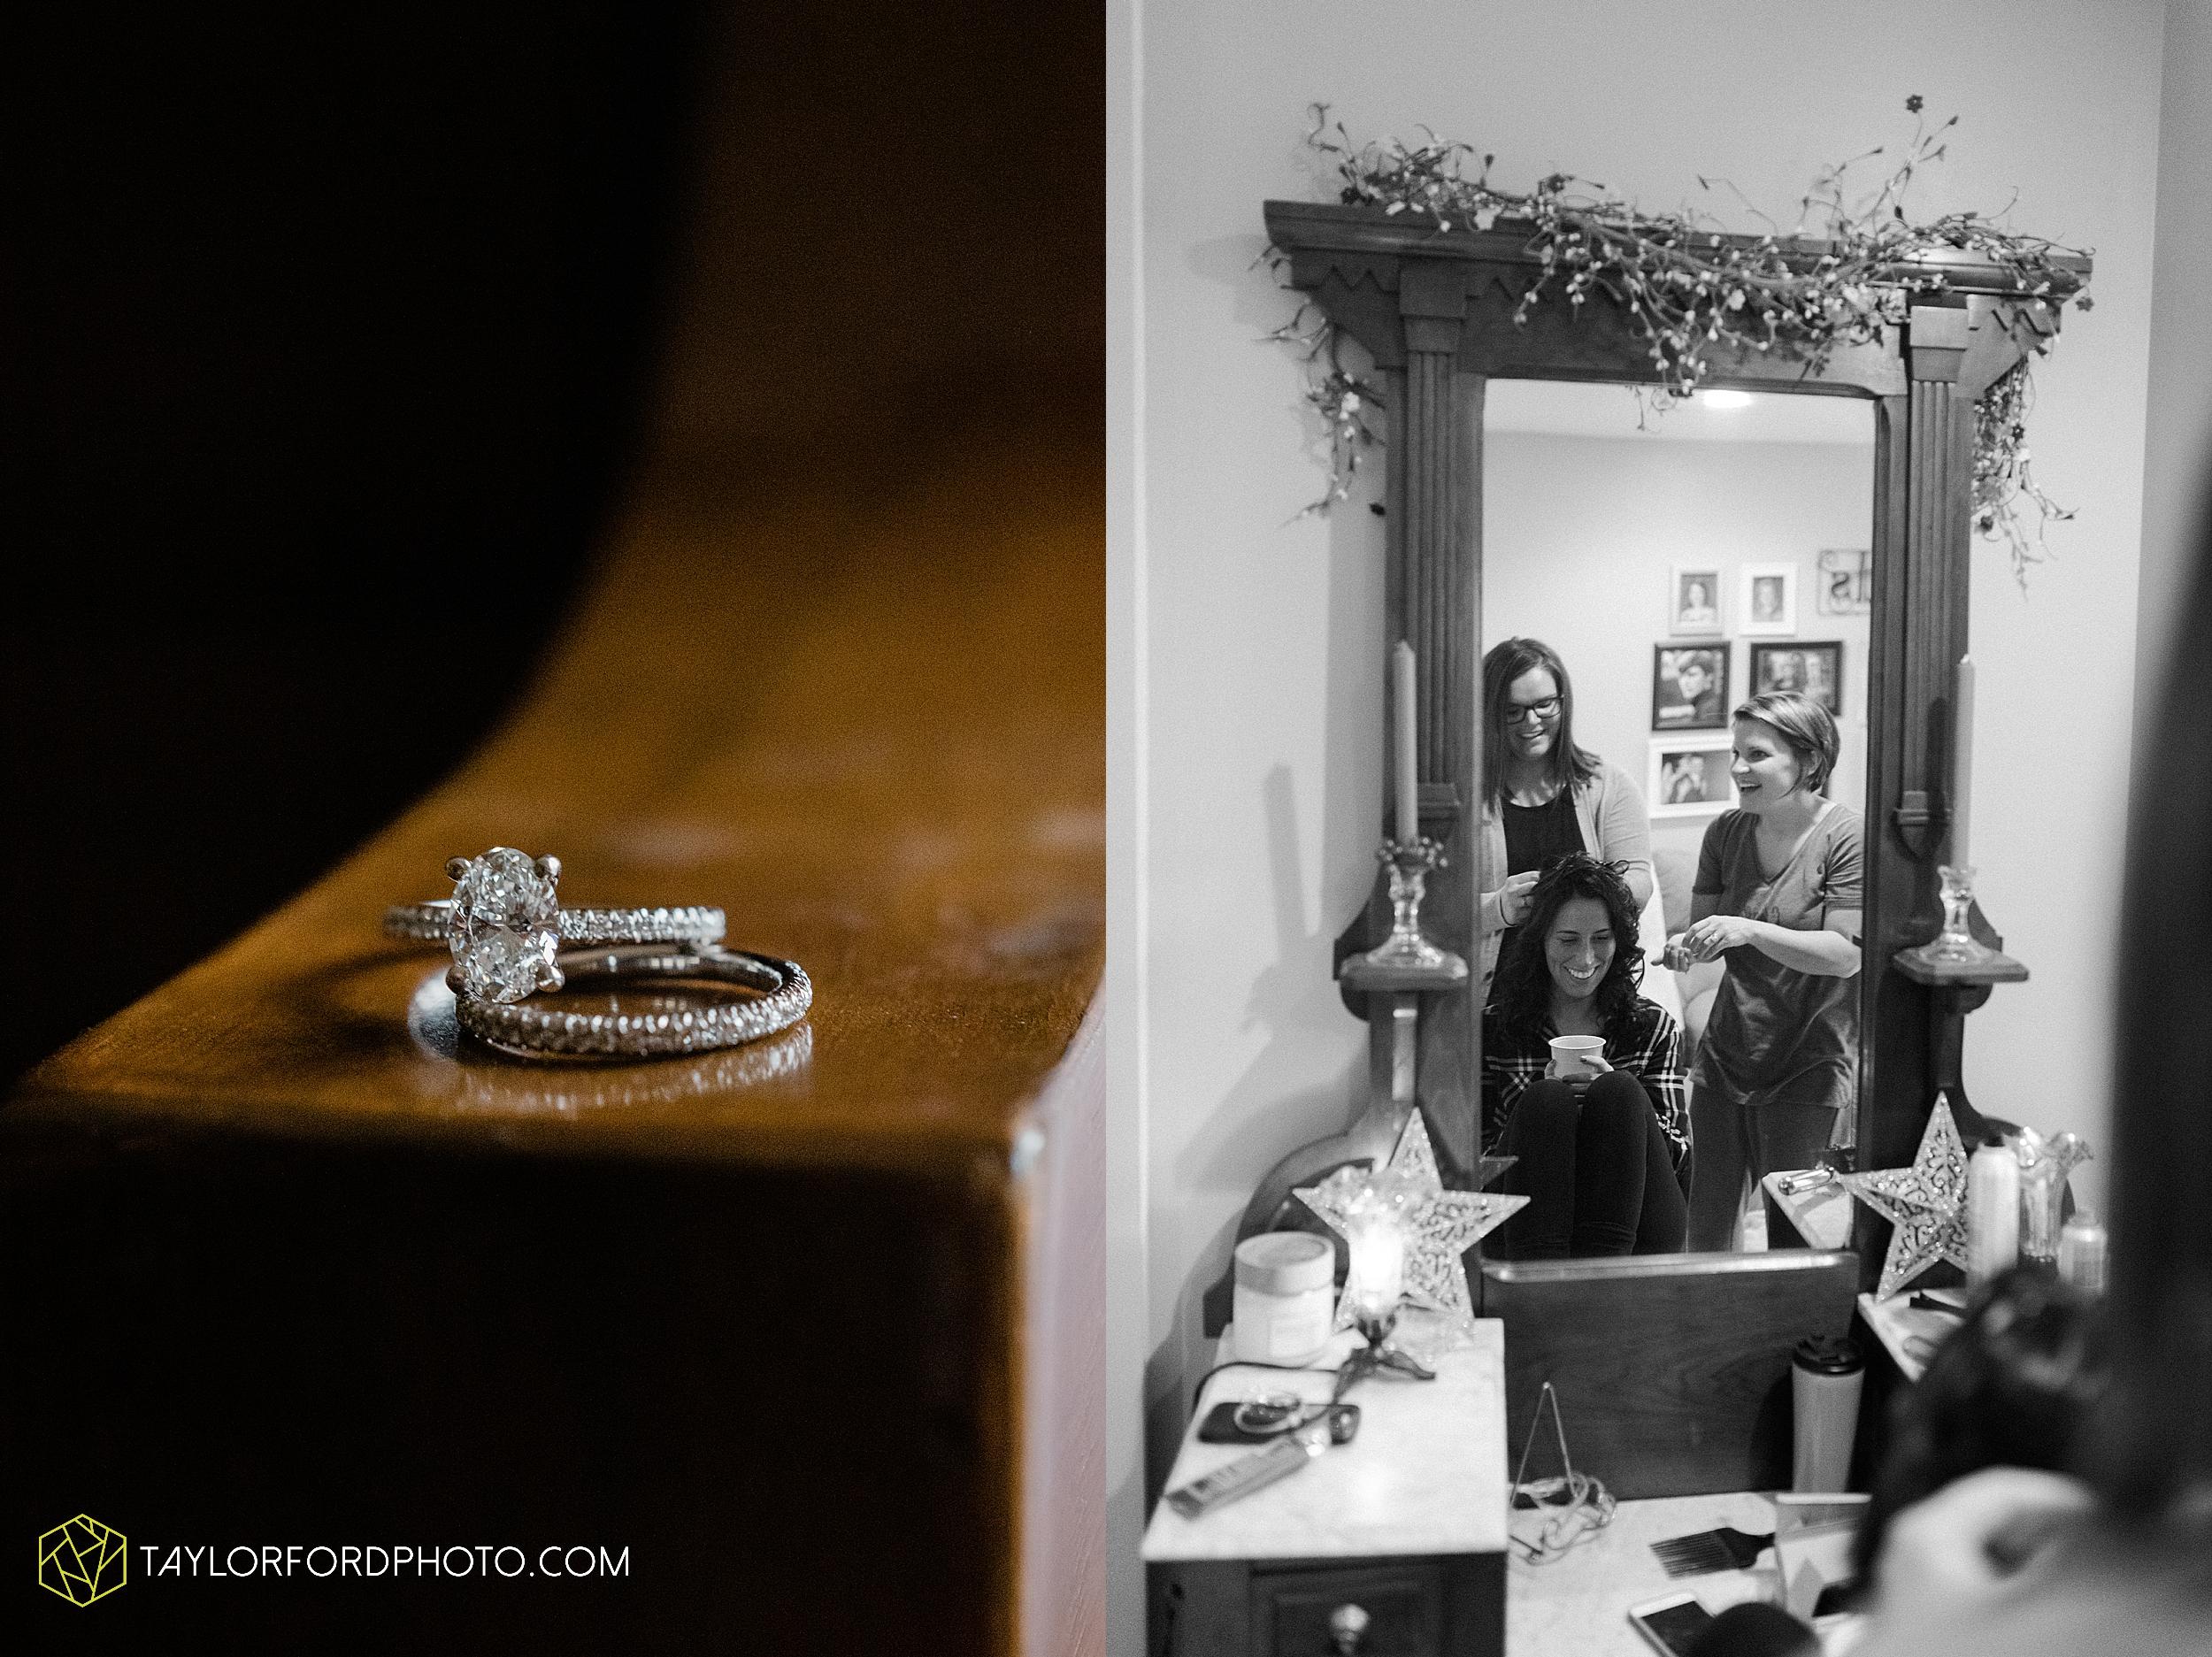 van-wert-ohio-first-united-methodist-downtown-van-wert-county-jr-fair-building-reception-winter-christmas-wedding-photographer-taylor-ford-hirschy-photographer_1860.jpg